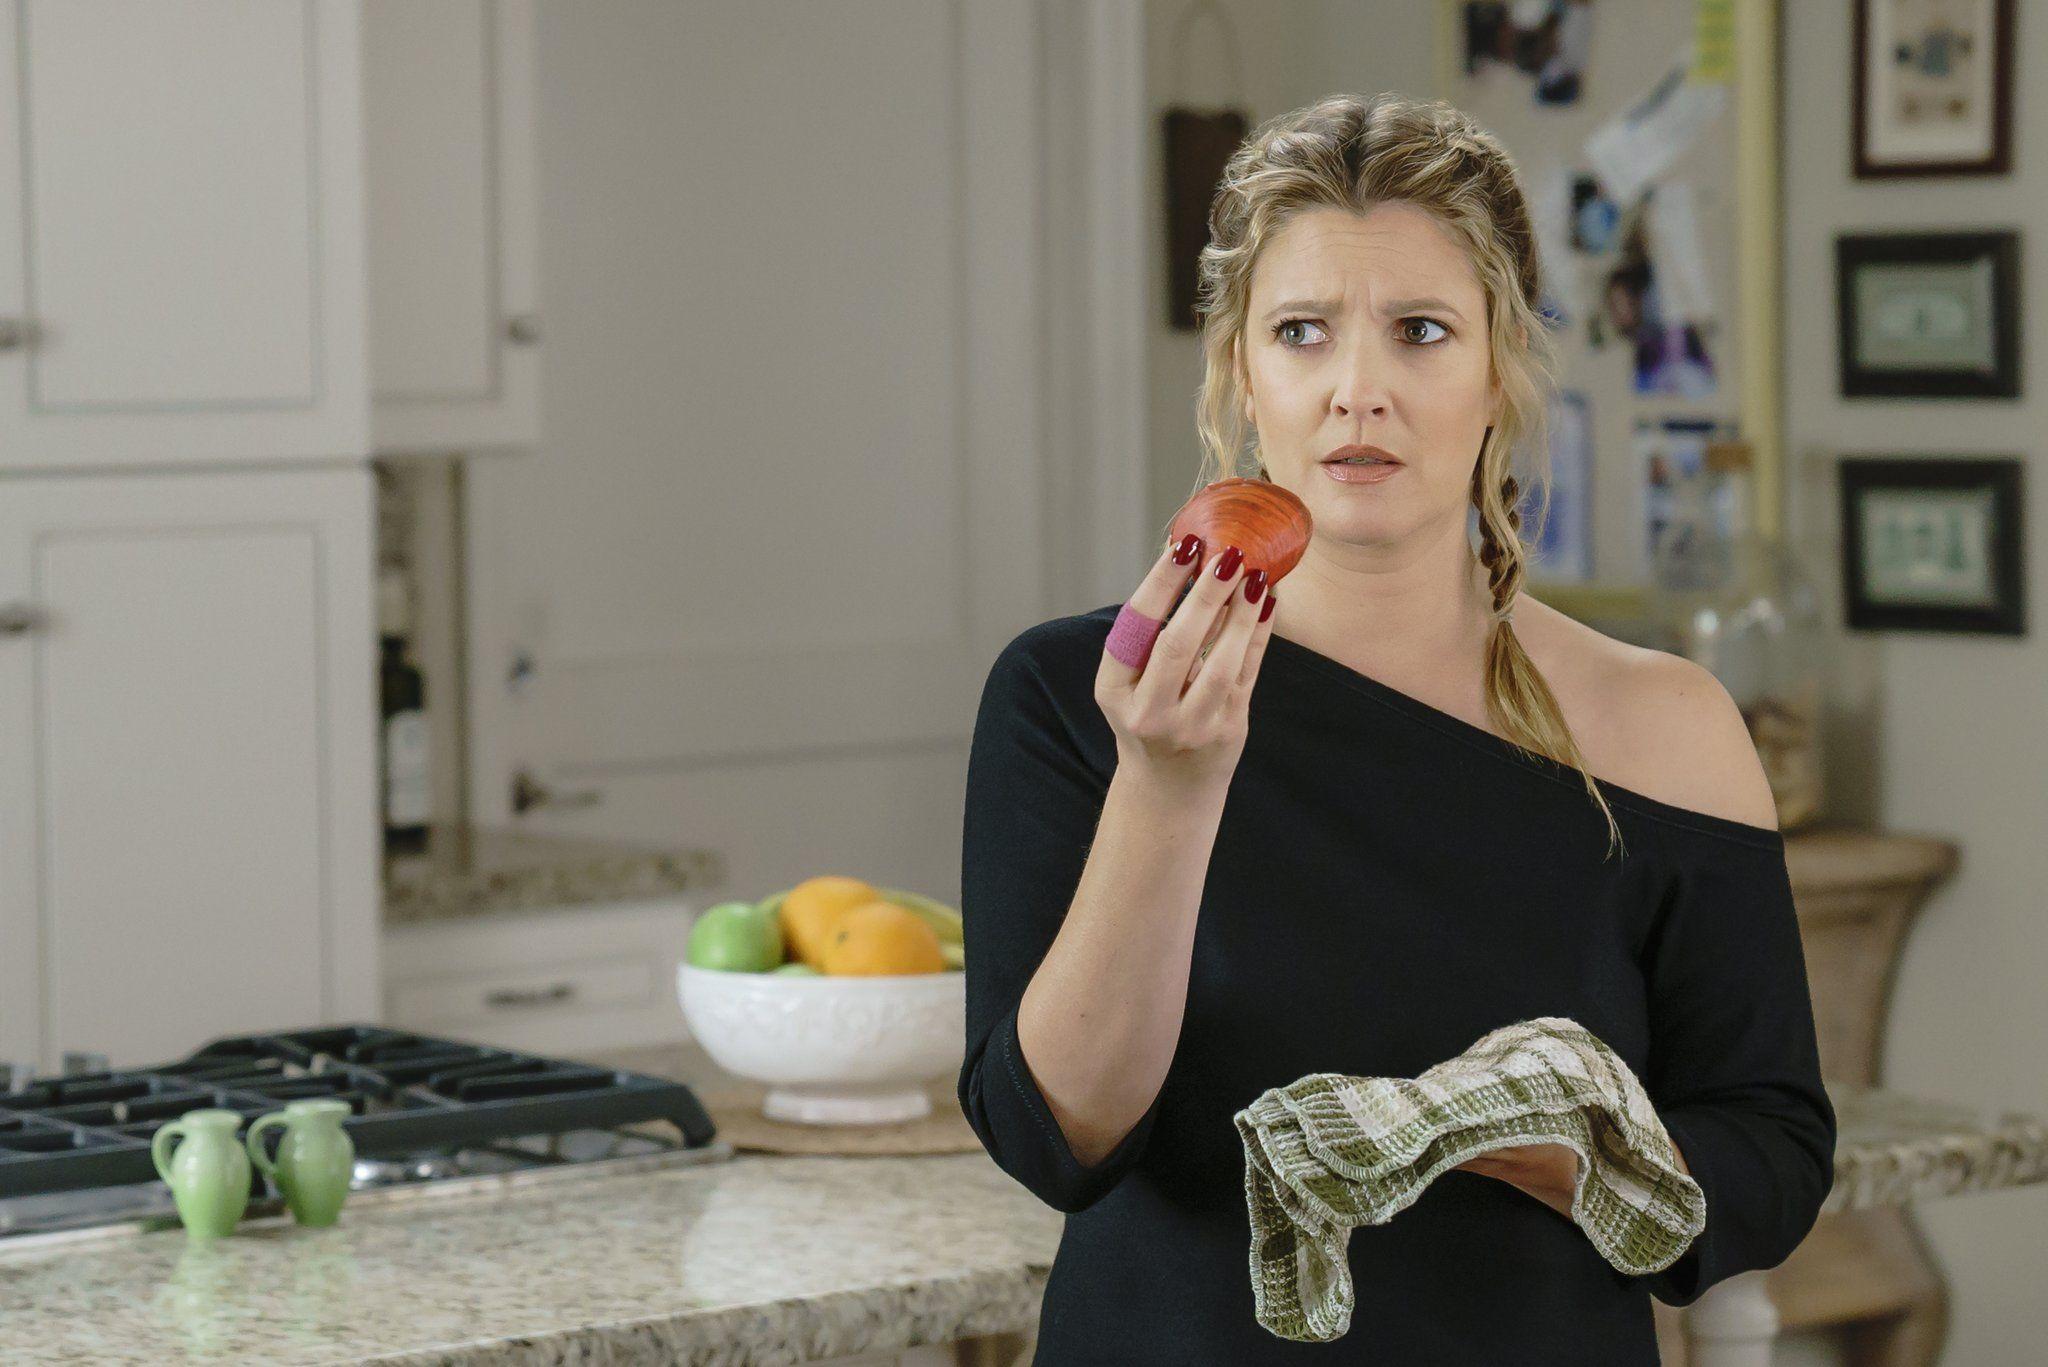 Santa Clarita Diet Season 3 Cast, Release Date, Episodes, Plot